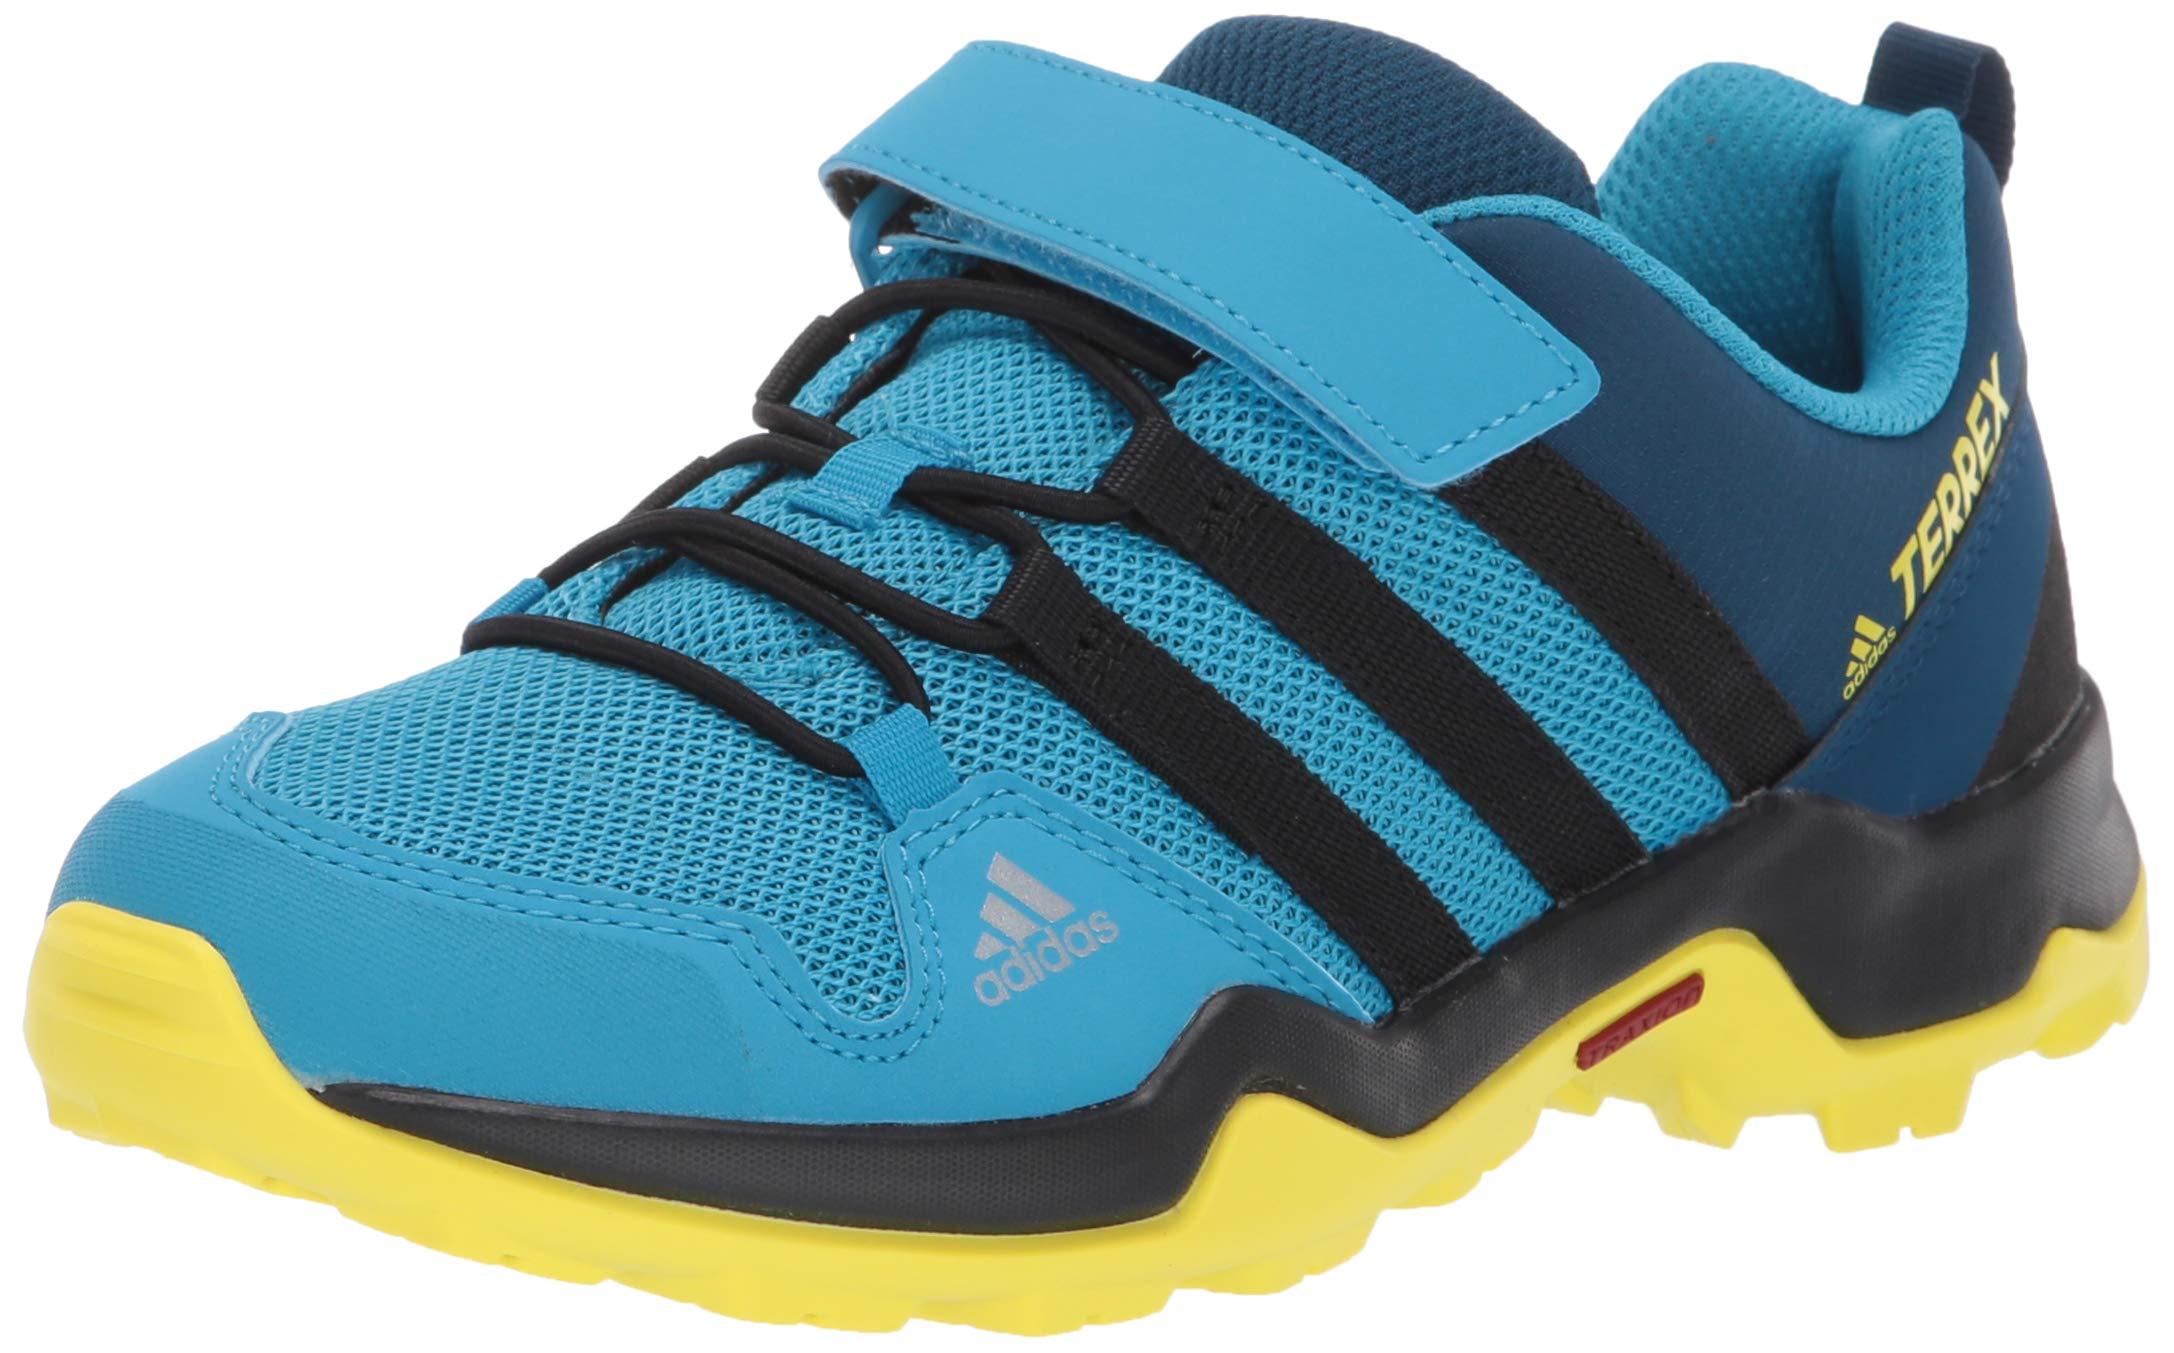 adidas outdoor Terrex AX2R CF Kids Hiking Shoe Boot, Cyan/Black/Shock Yellow, 10.5K Child US Little by adidas outdoor